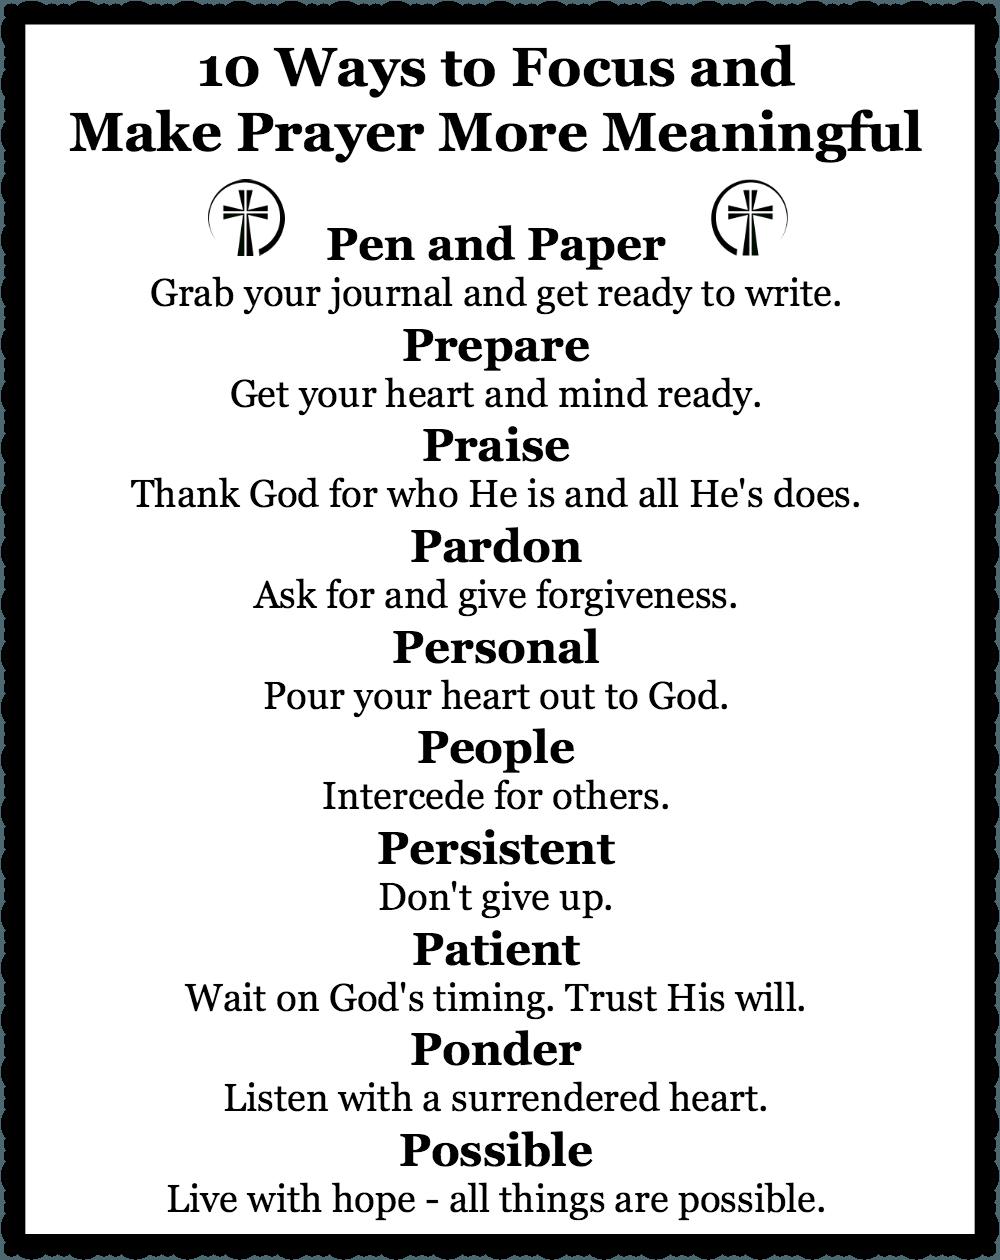 10 Ways to Focus and Make Prayer More Meaningful | Bible, Spiritual ...